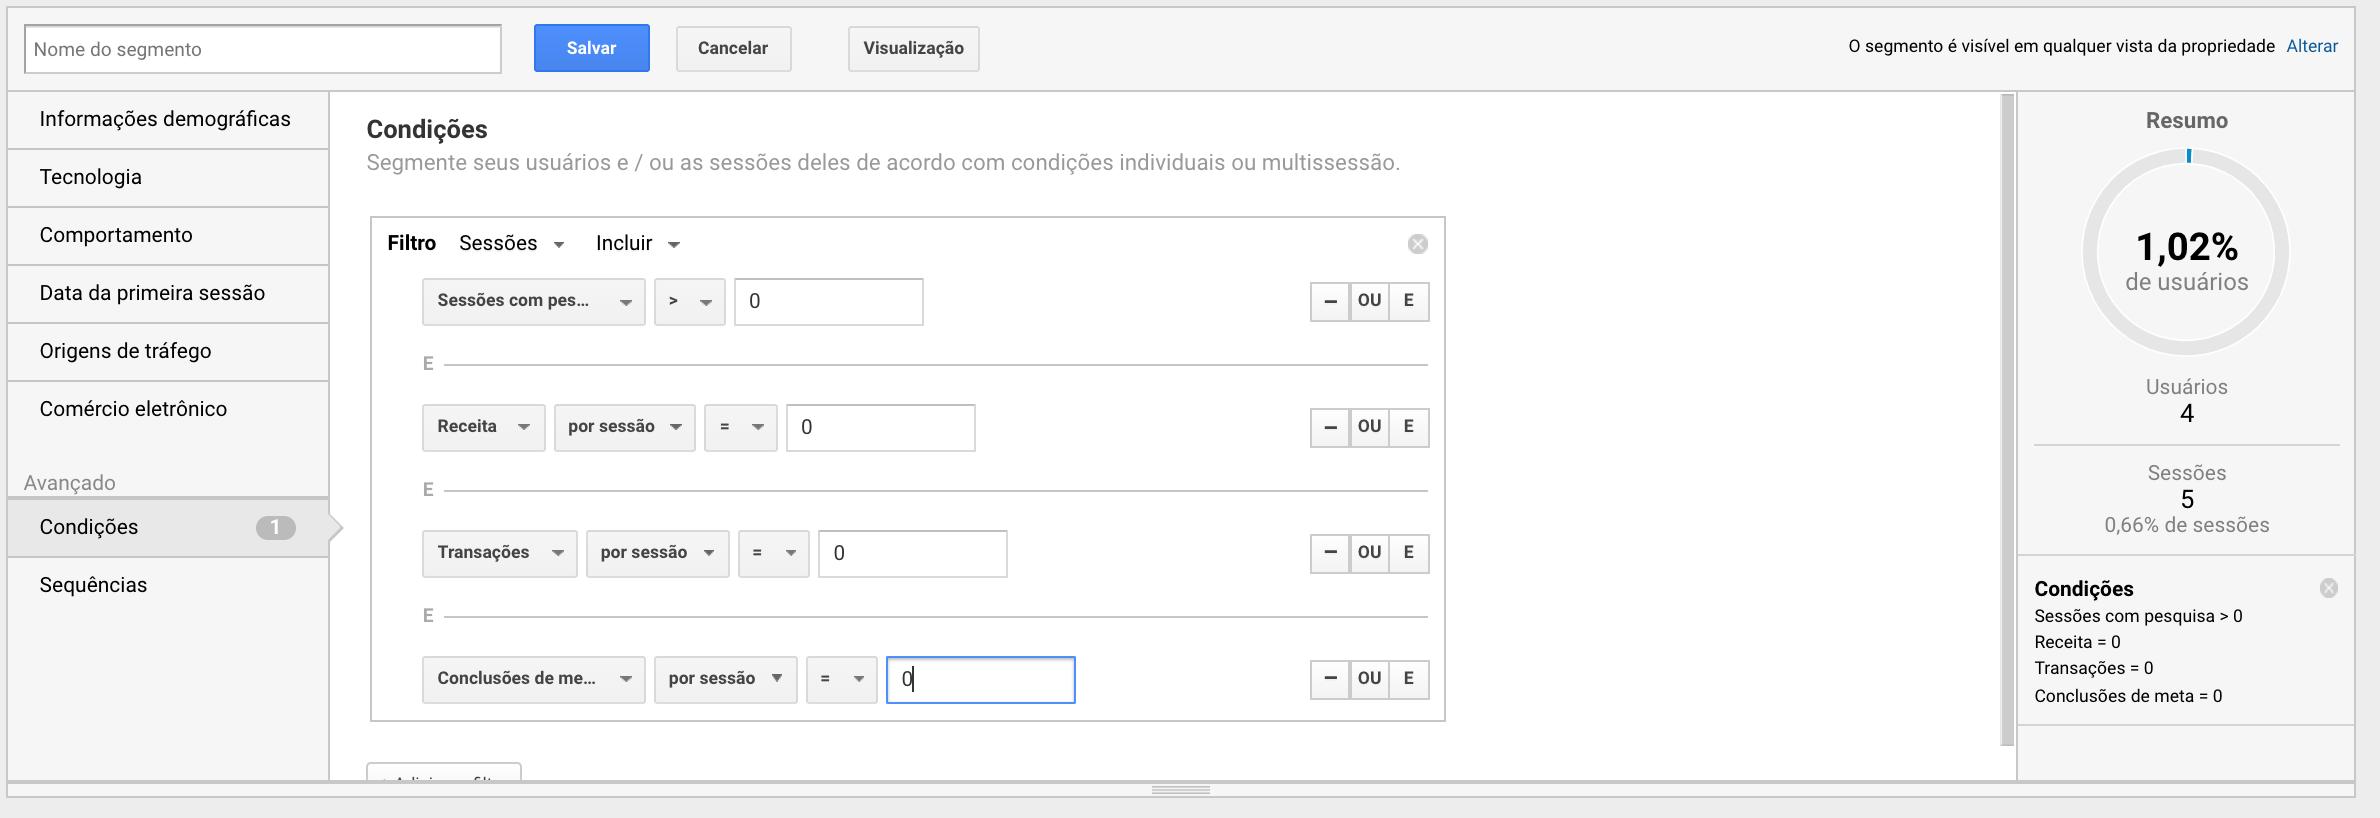 googleanalytics-listaremarketing-5 (1).png